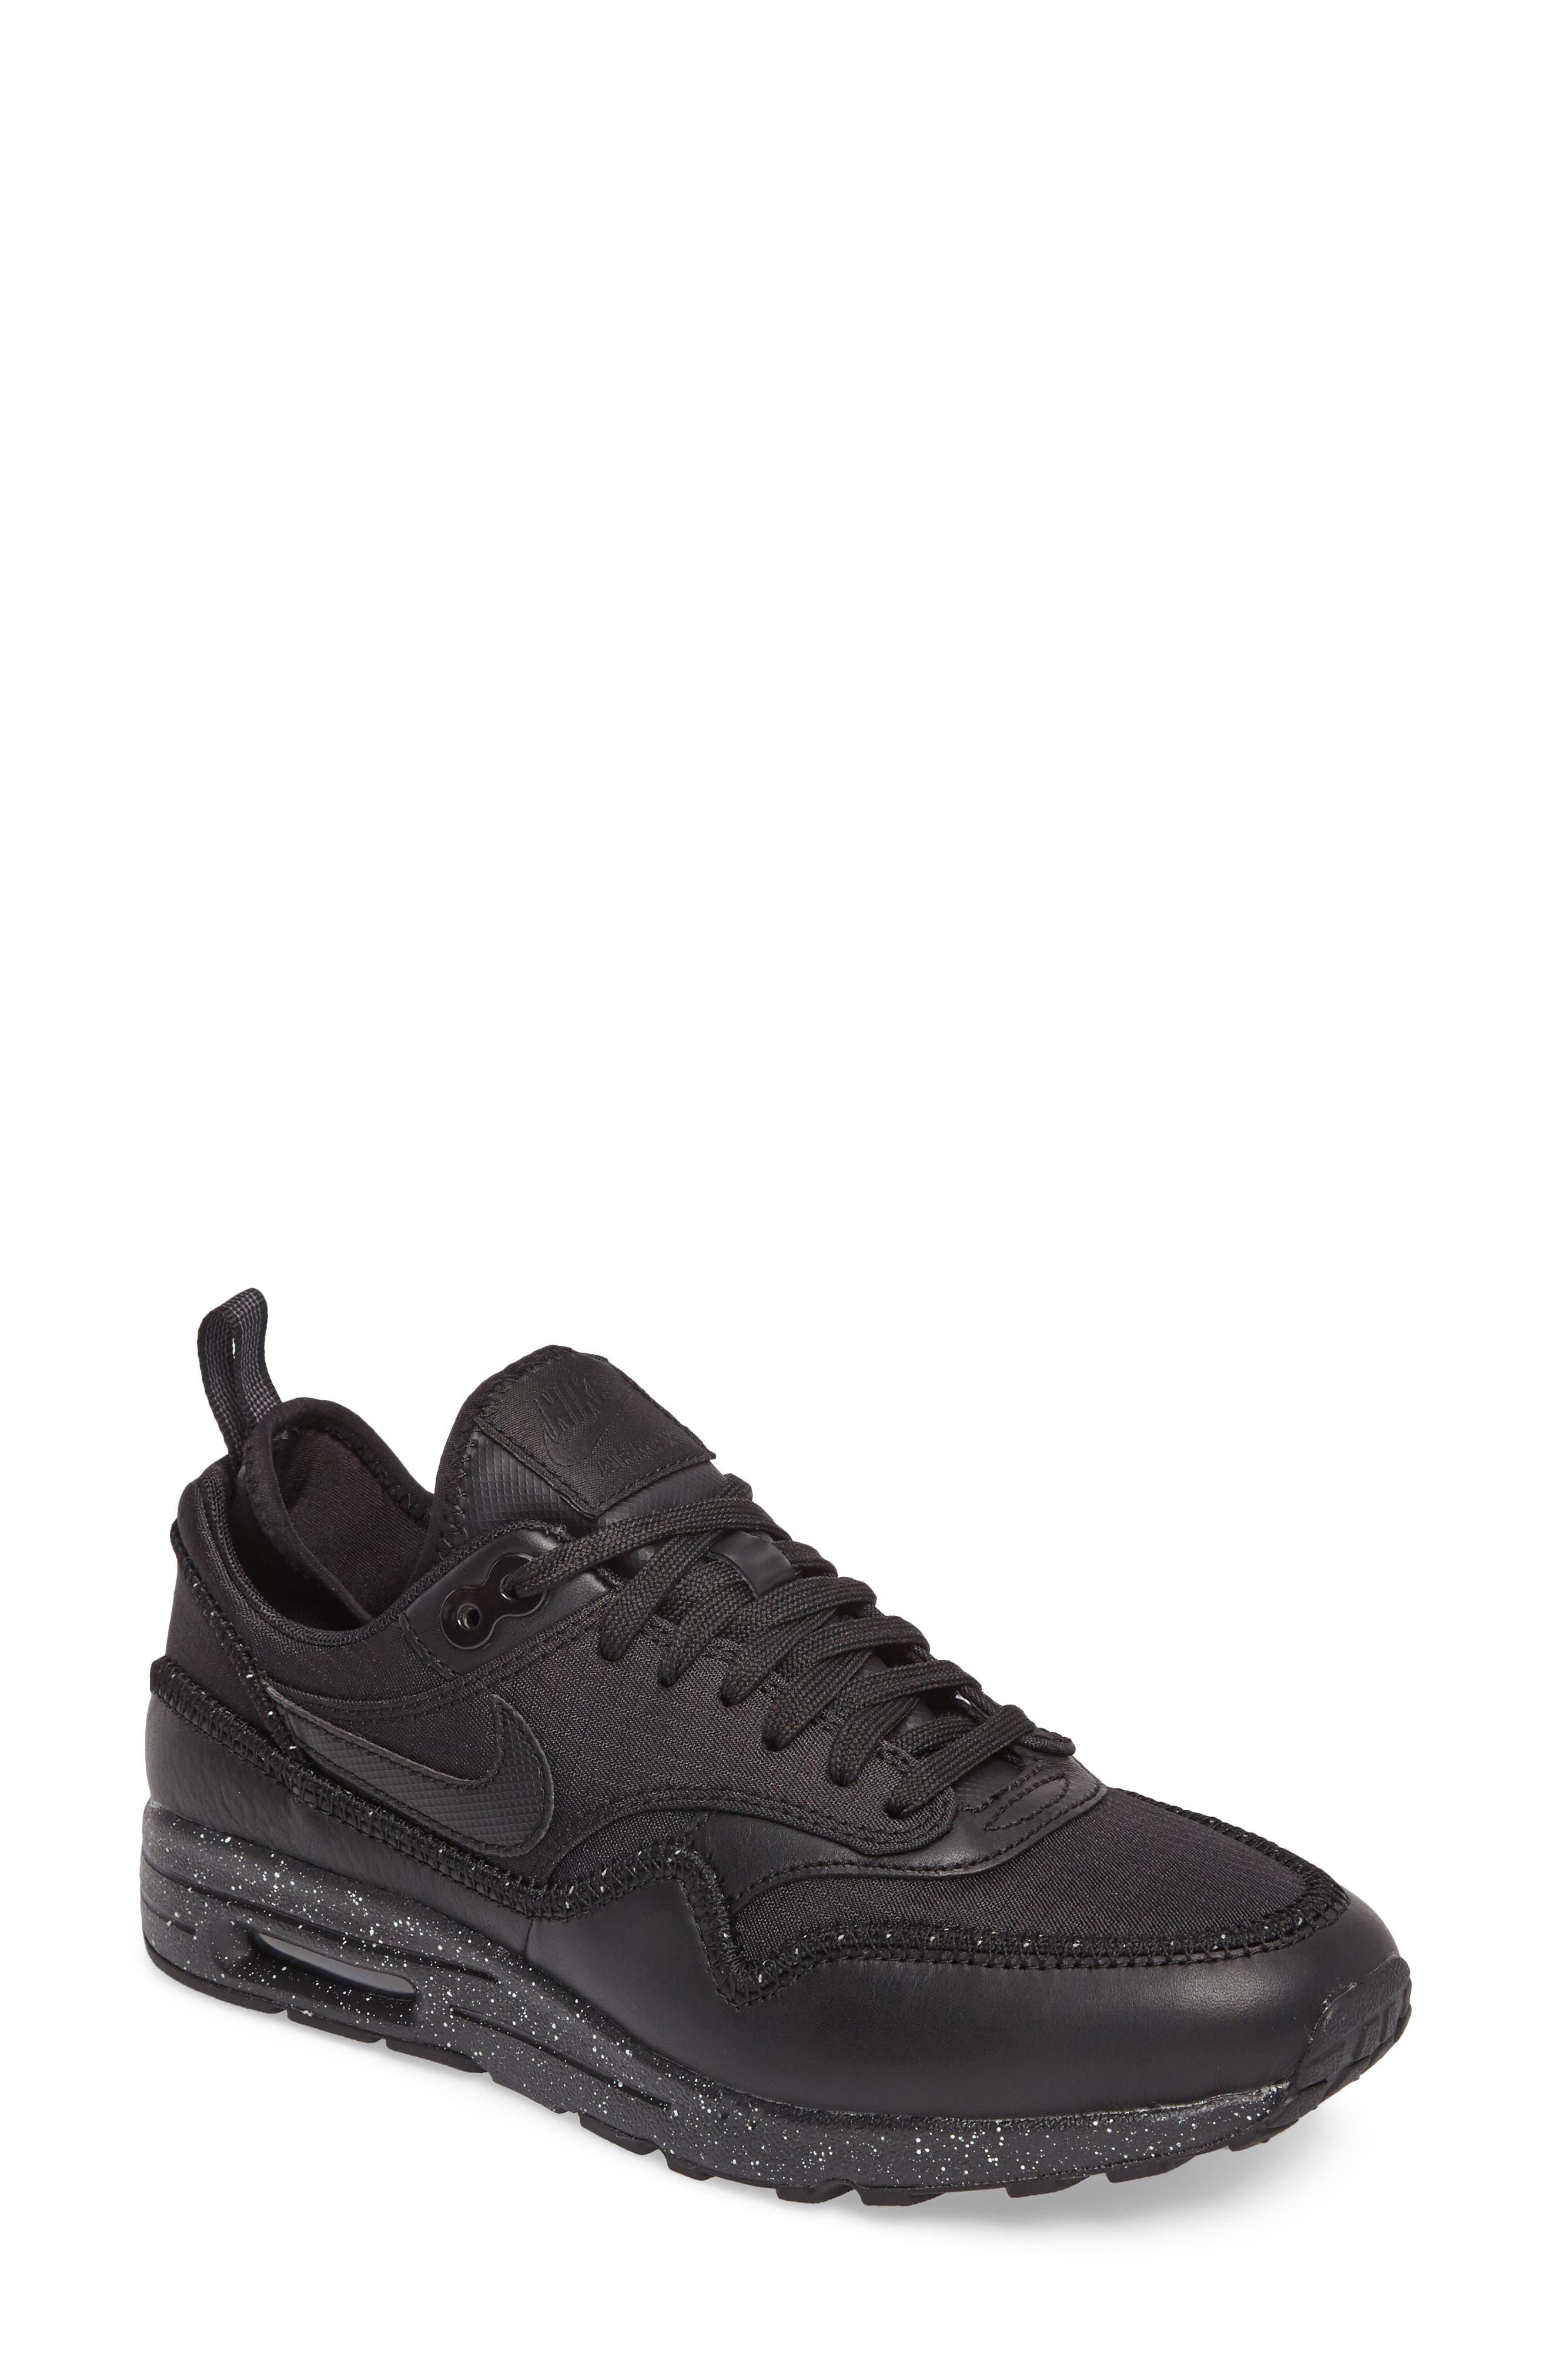 Air Max 1 Ultra 2.0 SI Sneaker,                             Main thumbnail 1, color,                             002